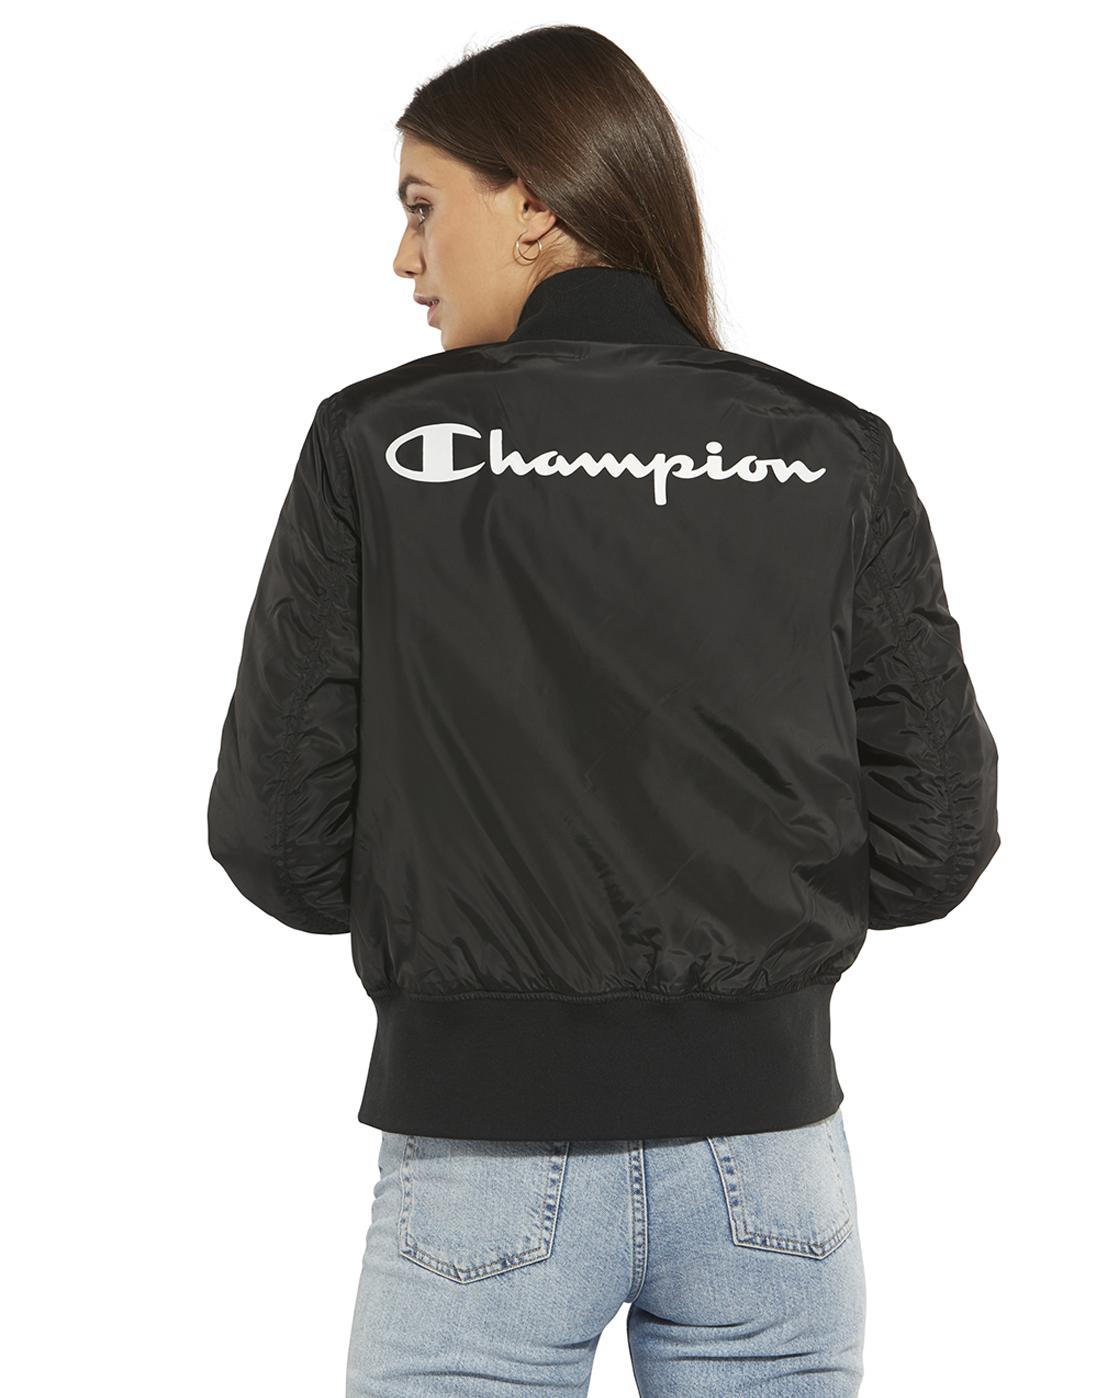 840f73924c83 Women's Black Champion Bomber Jacket   Life Style Sports